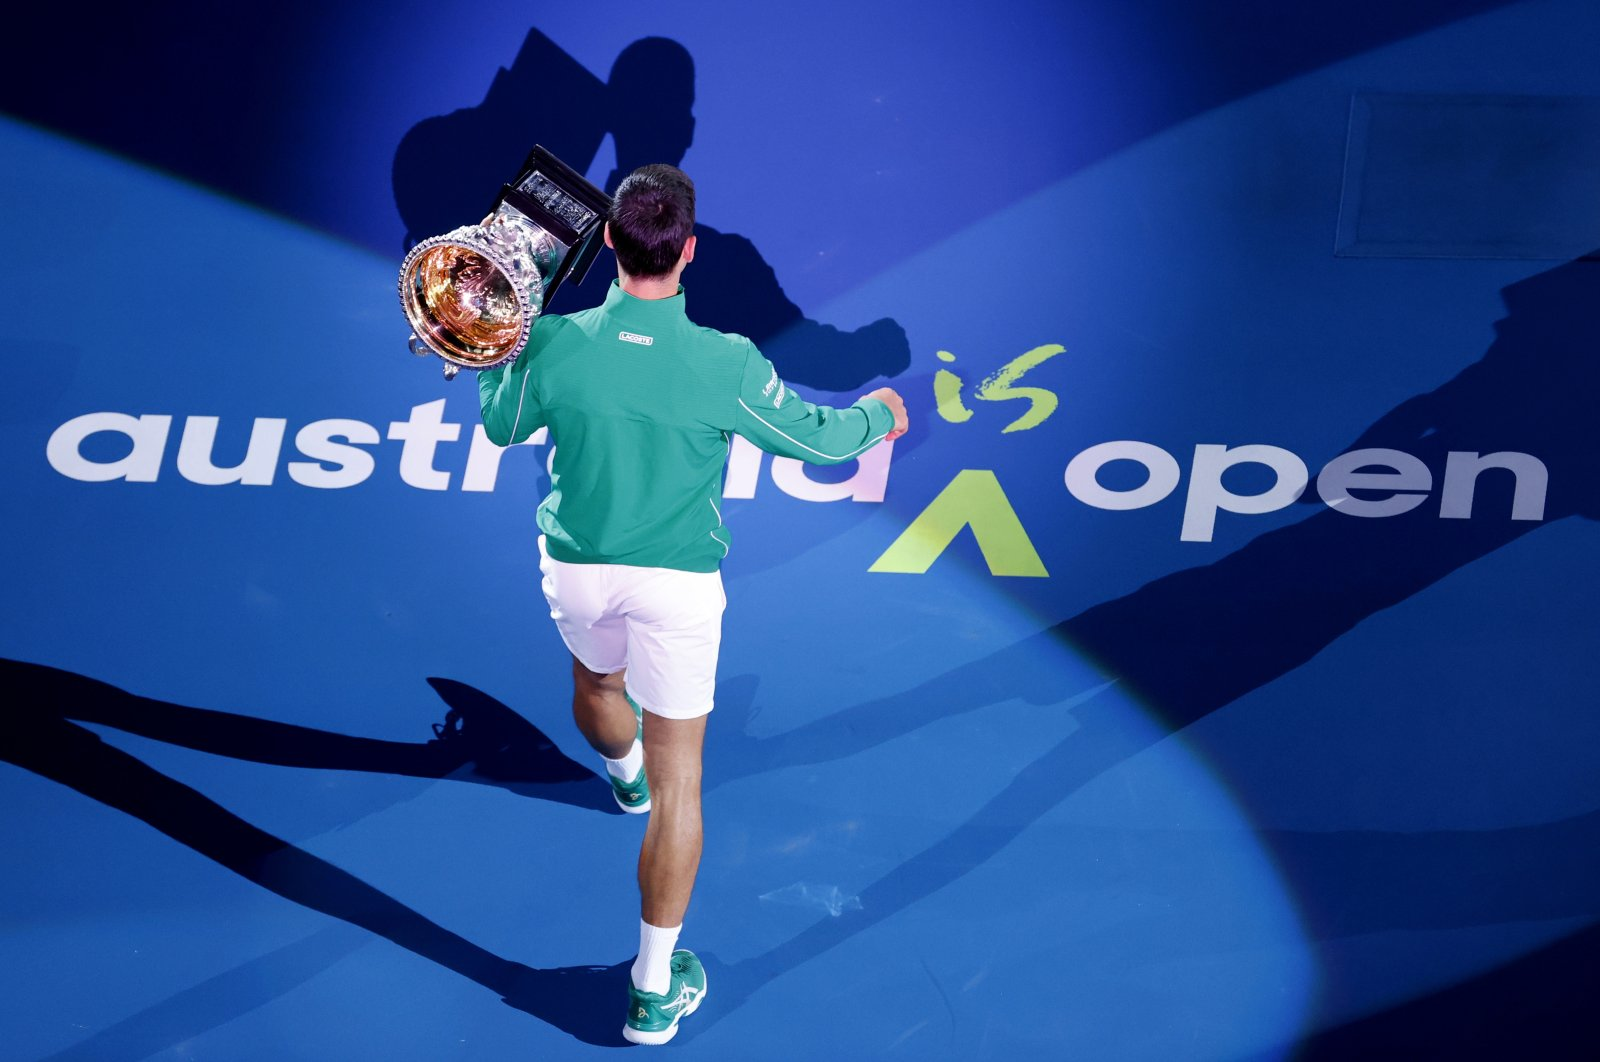 Novak Djokovic holds his trophy after winning the Australian Open tennis tournament, in Melbourne, Australia, Feb. 3, 2020. (AP Photo)